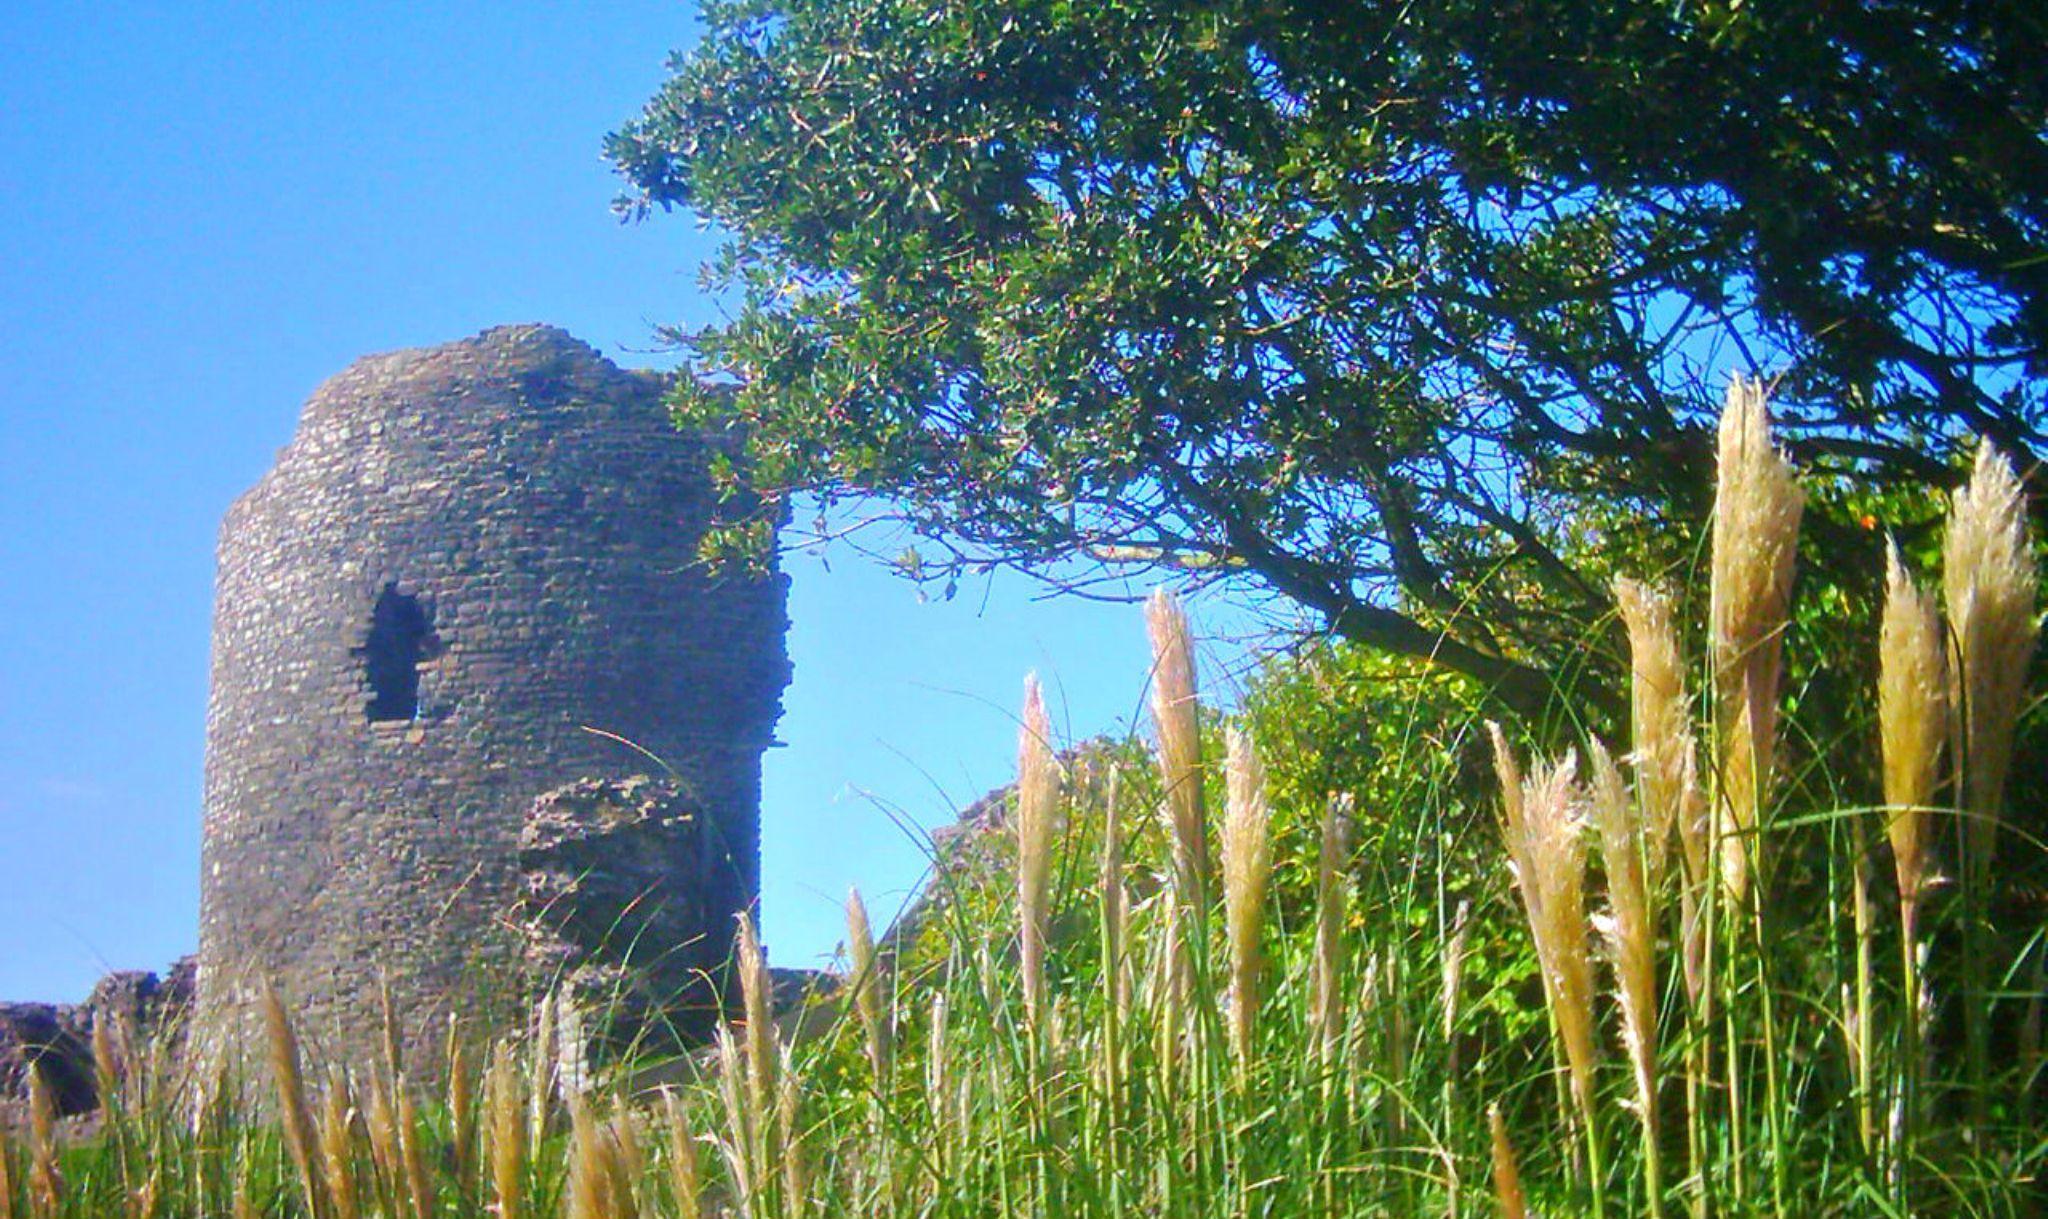 the old castle aberystwyth by chris.adams.3557